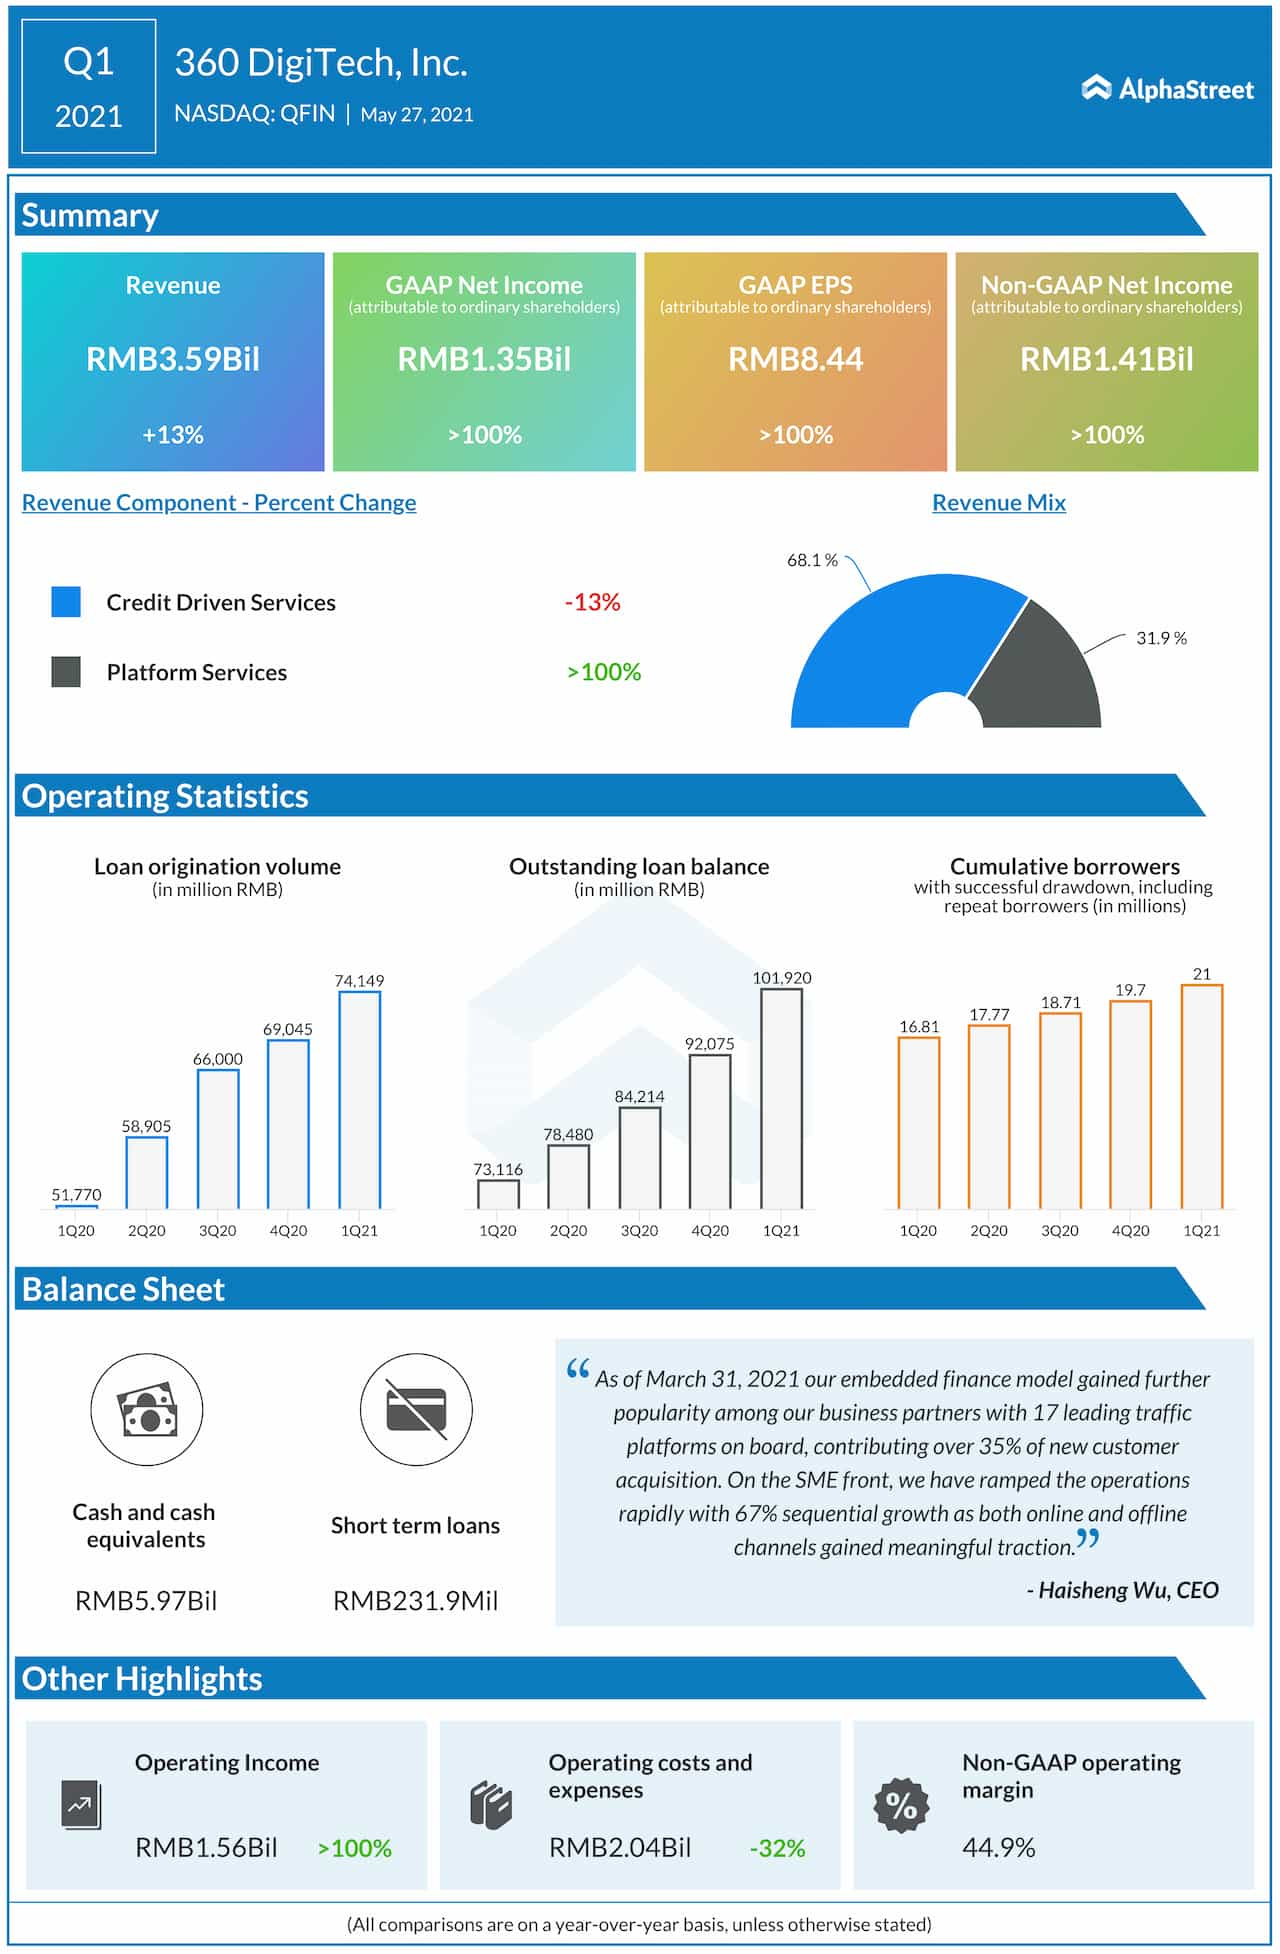 360 DigiTech Q1 2021 earnings infographic